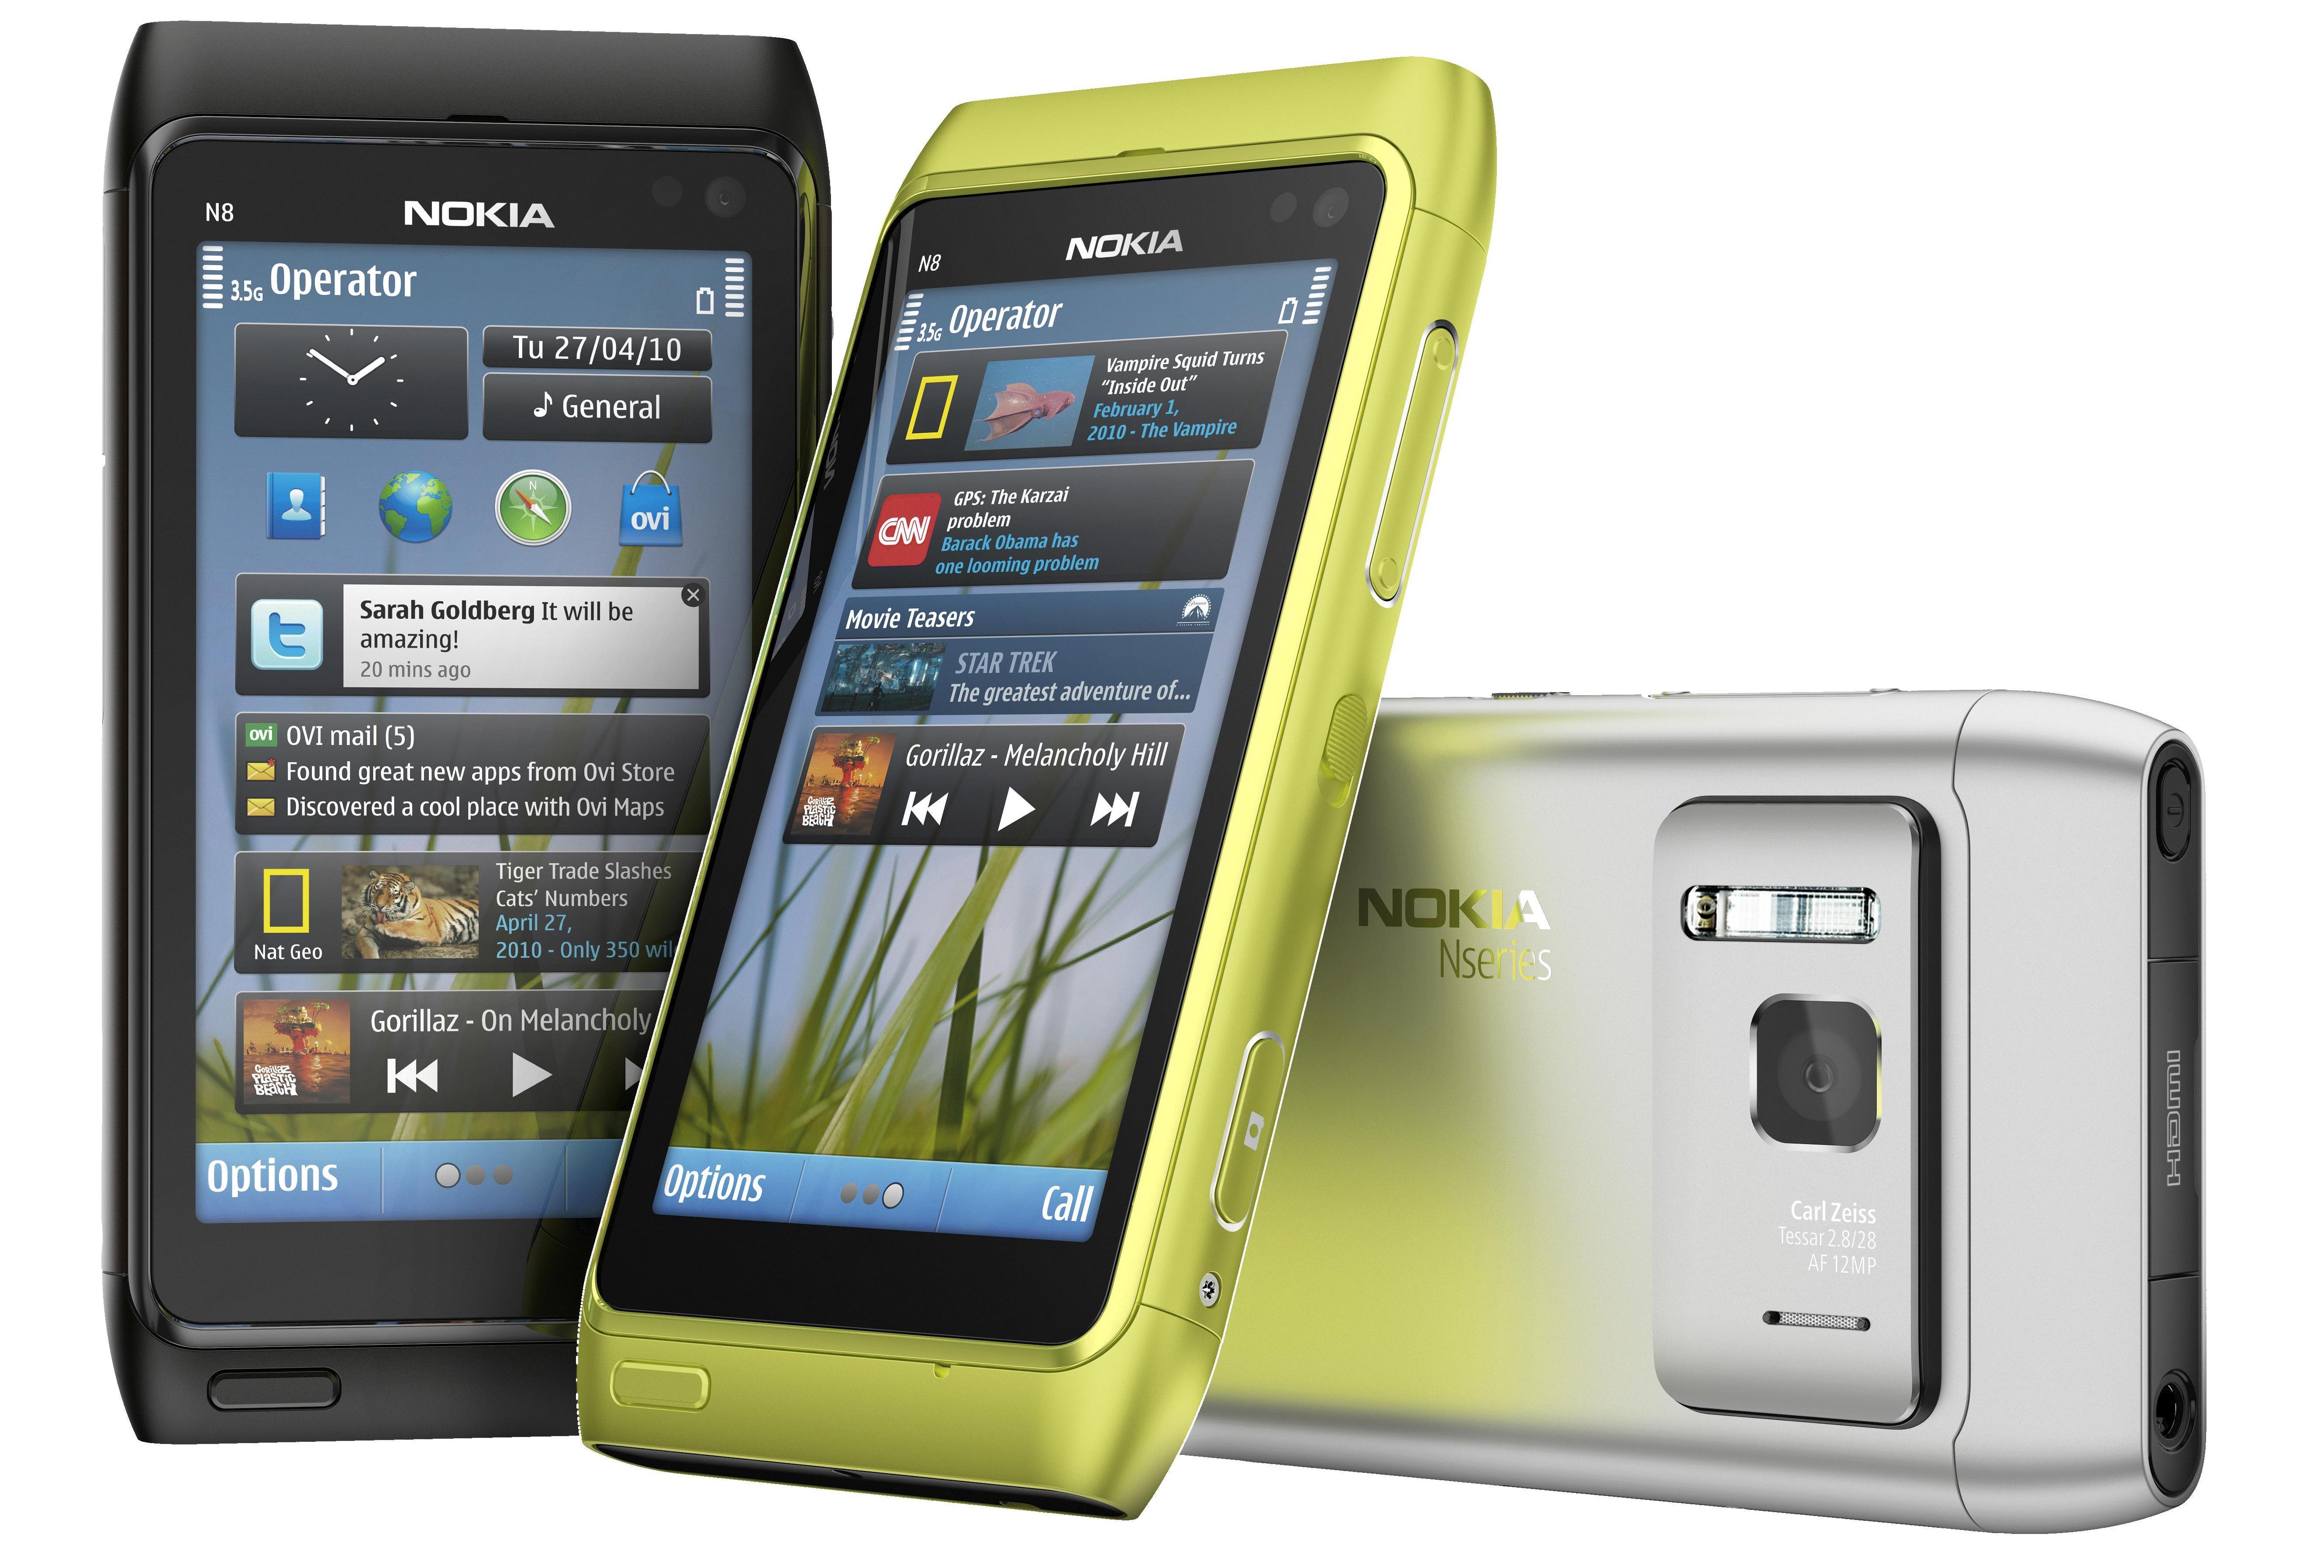 The Nokia N8 Australian Launch Event – Geek Actually